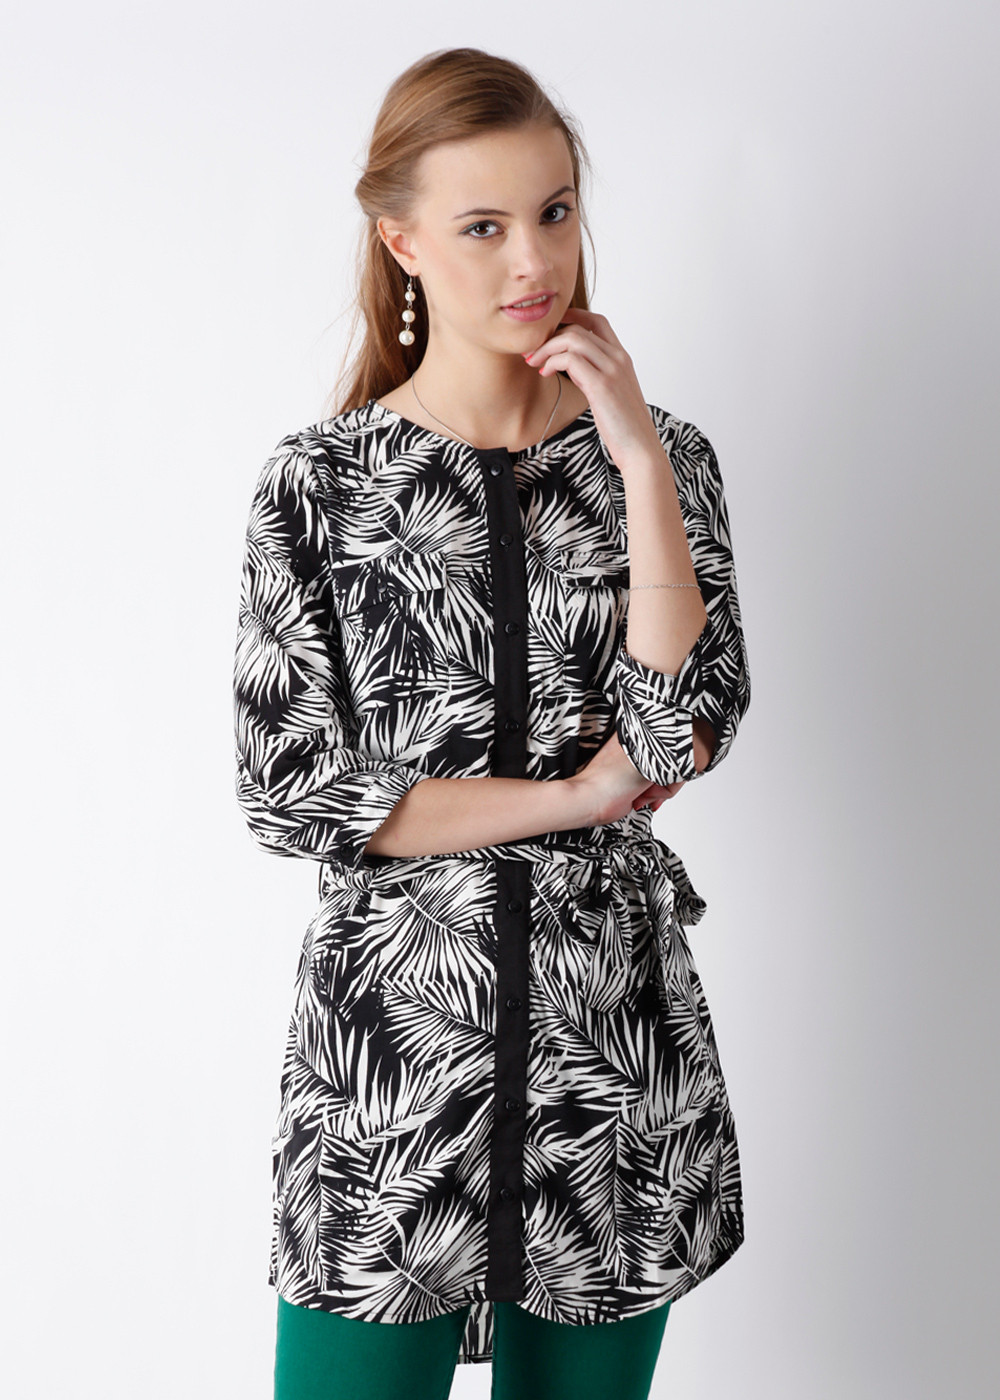 Buy Femella Front Ruffle Top For Women: Buy Femella Printed Women's Tunic @ ₹ 990 By Femella From